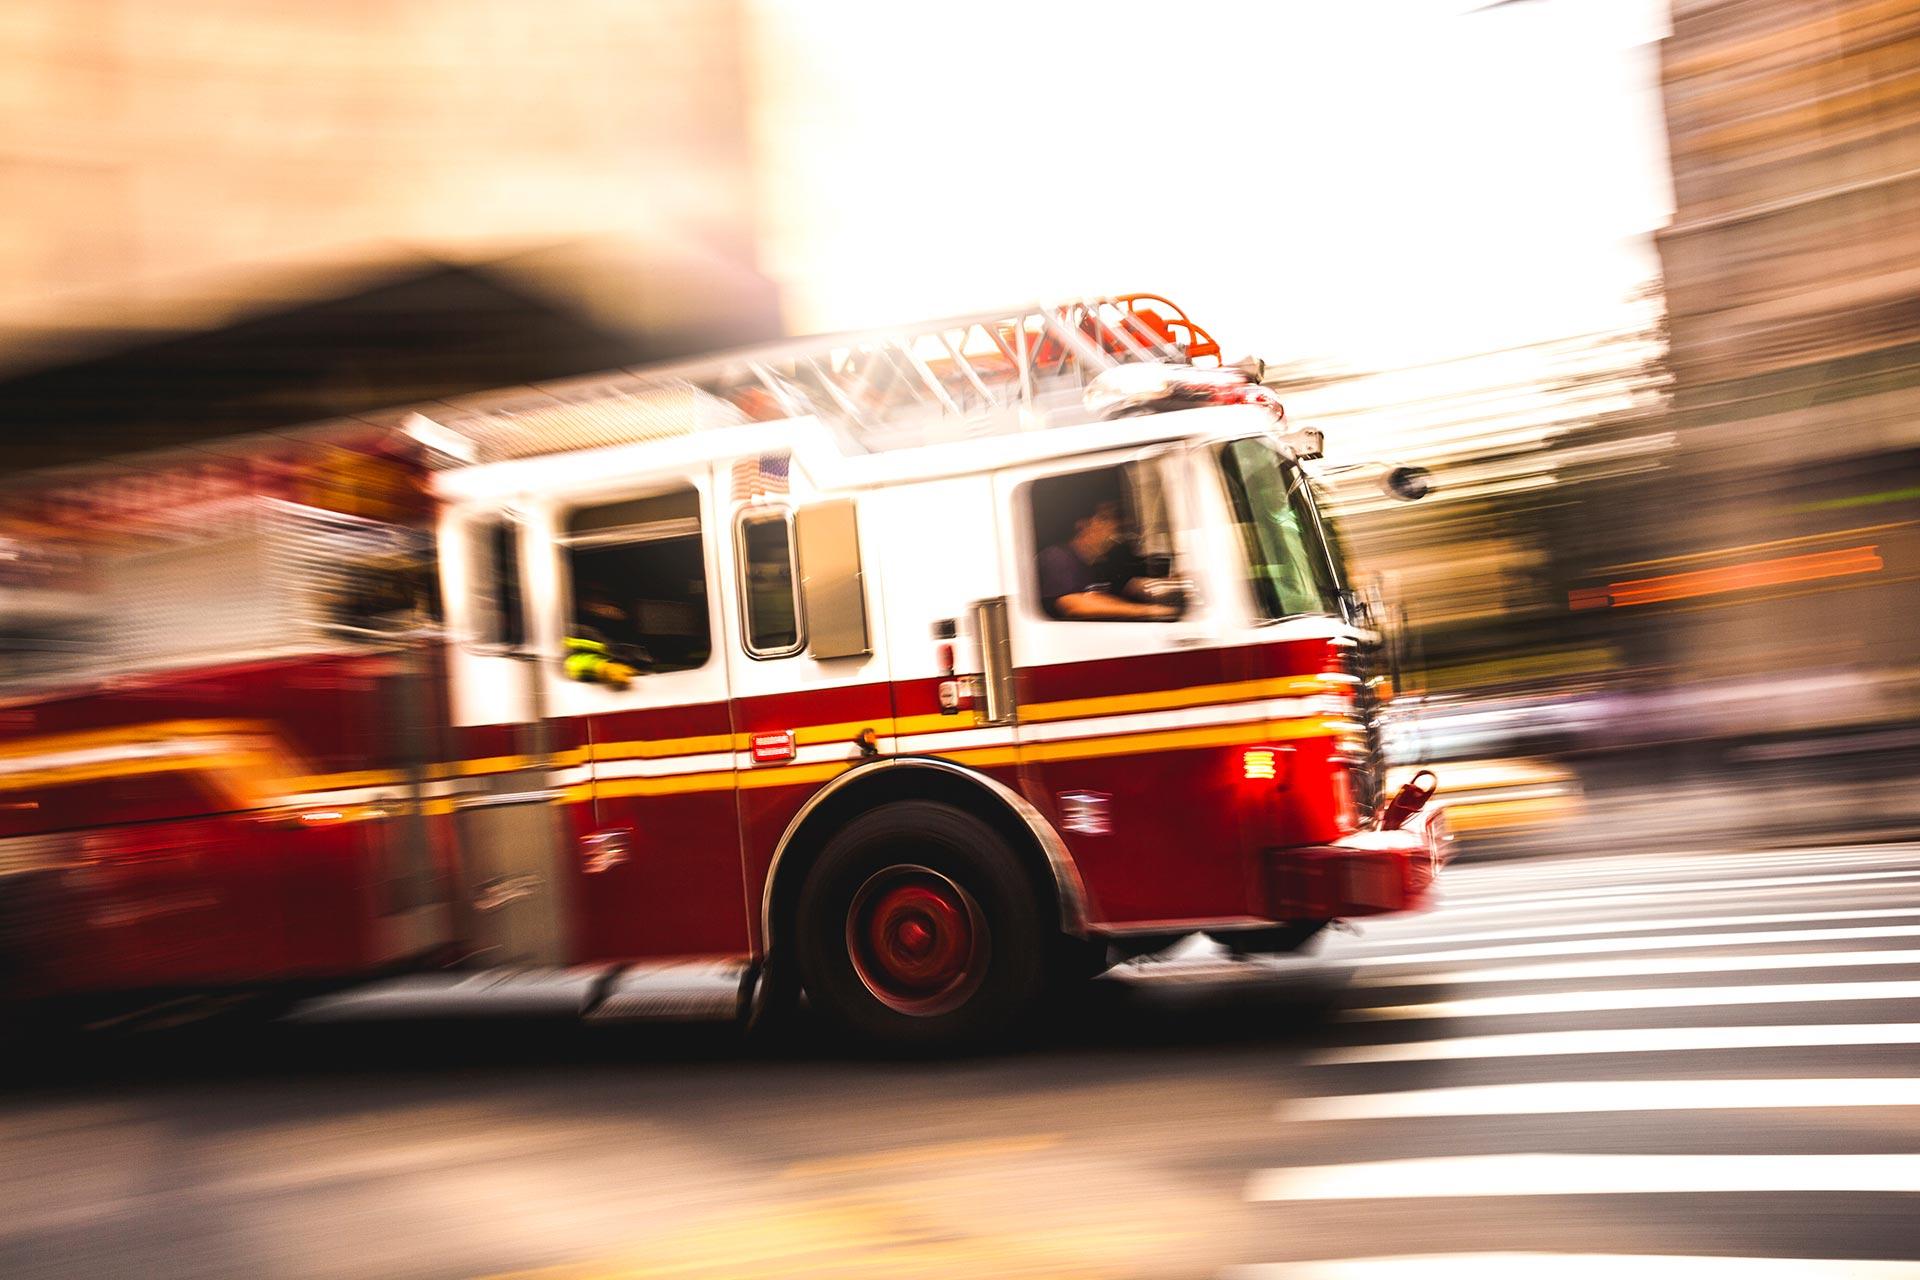 firetruck-blurred.jpg